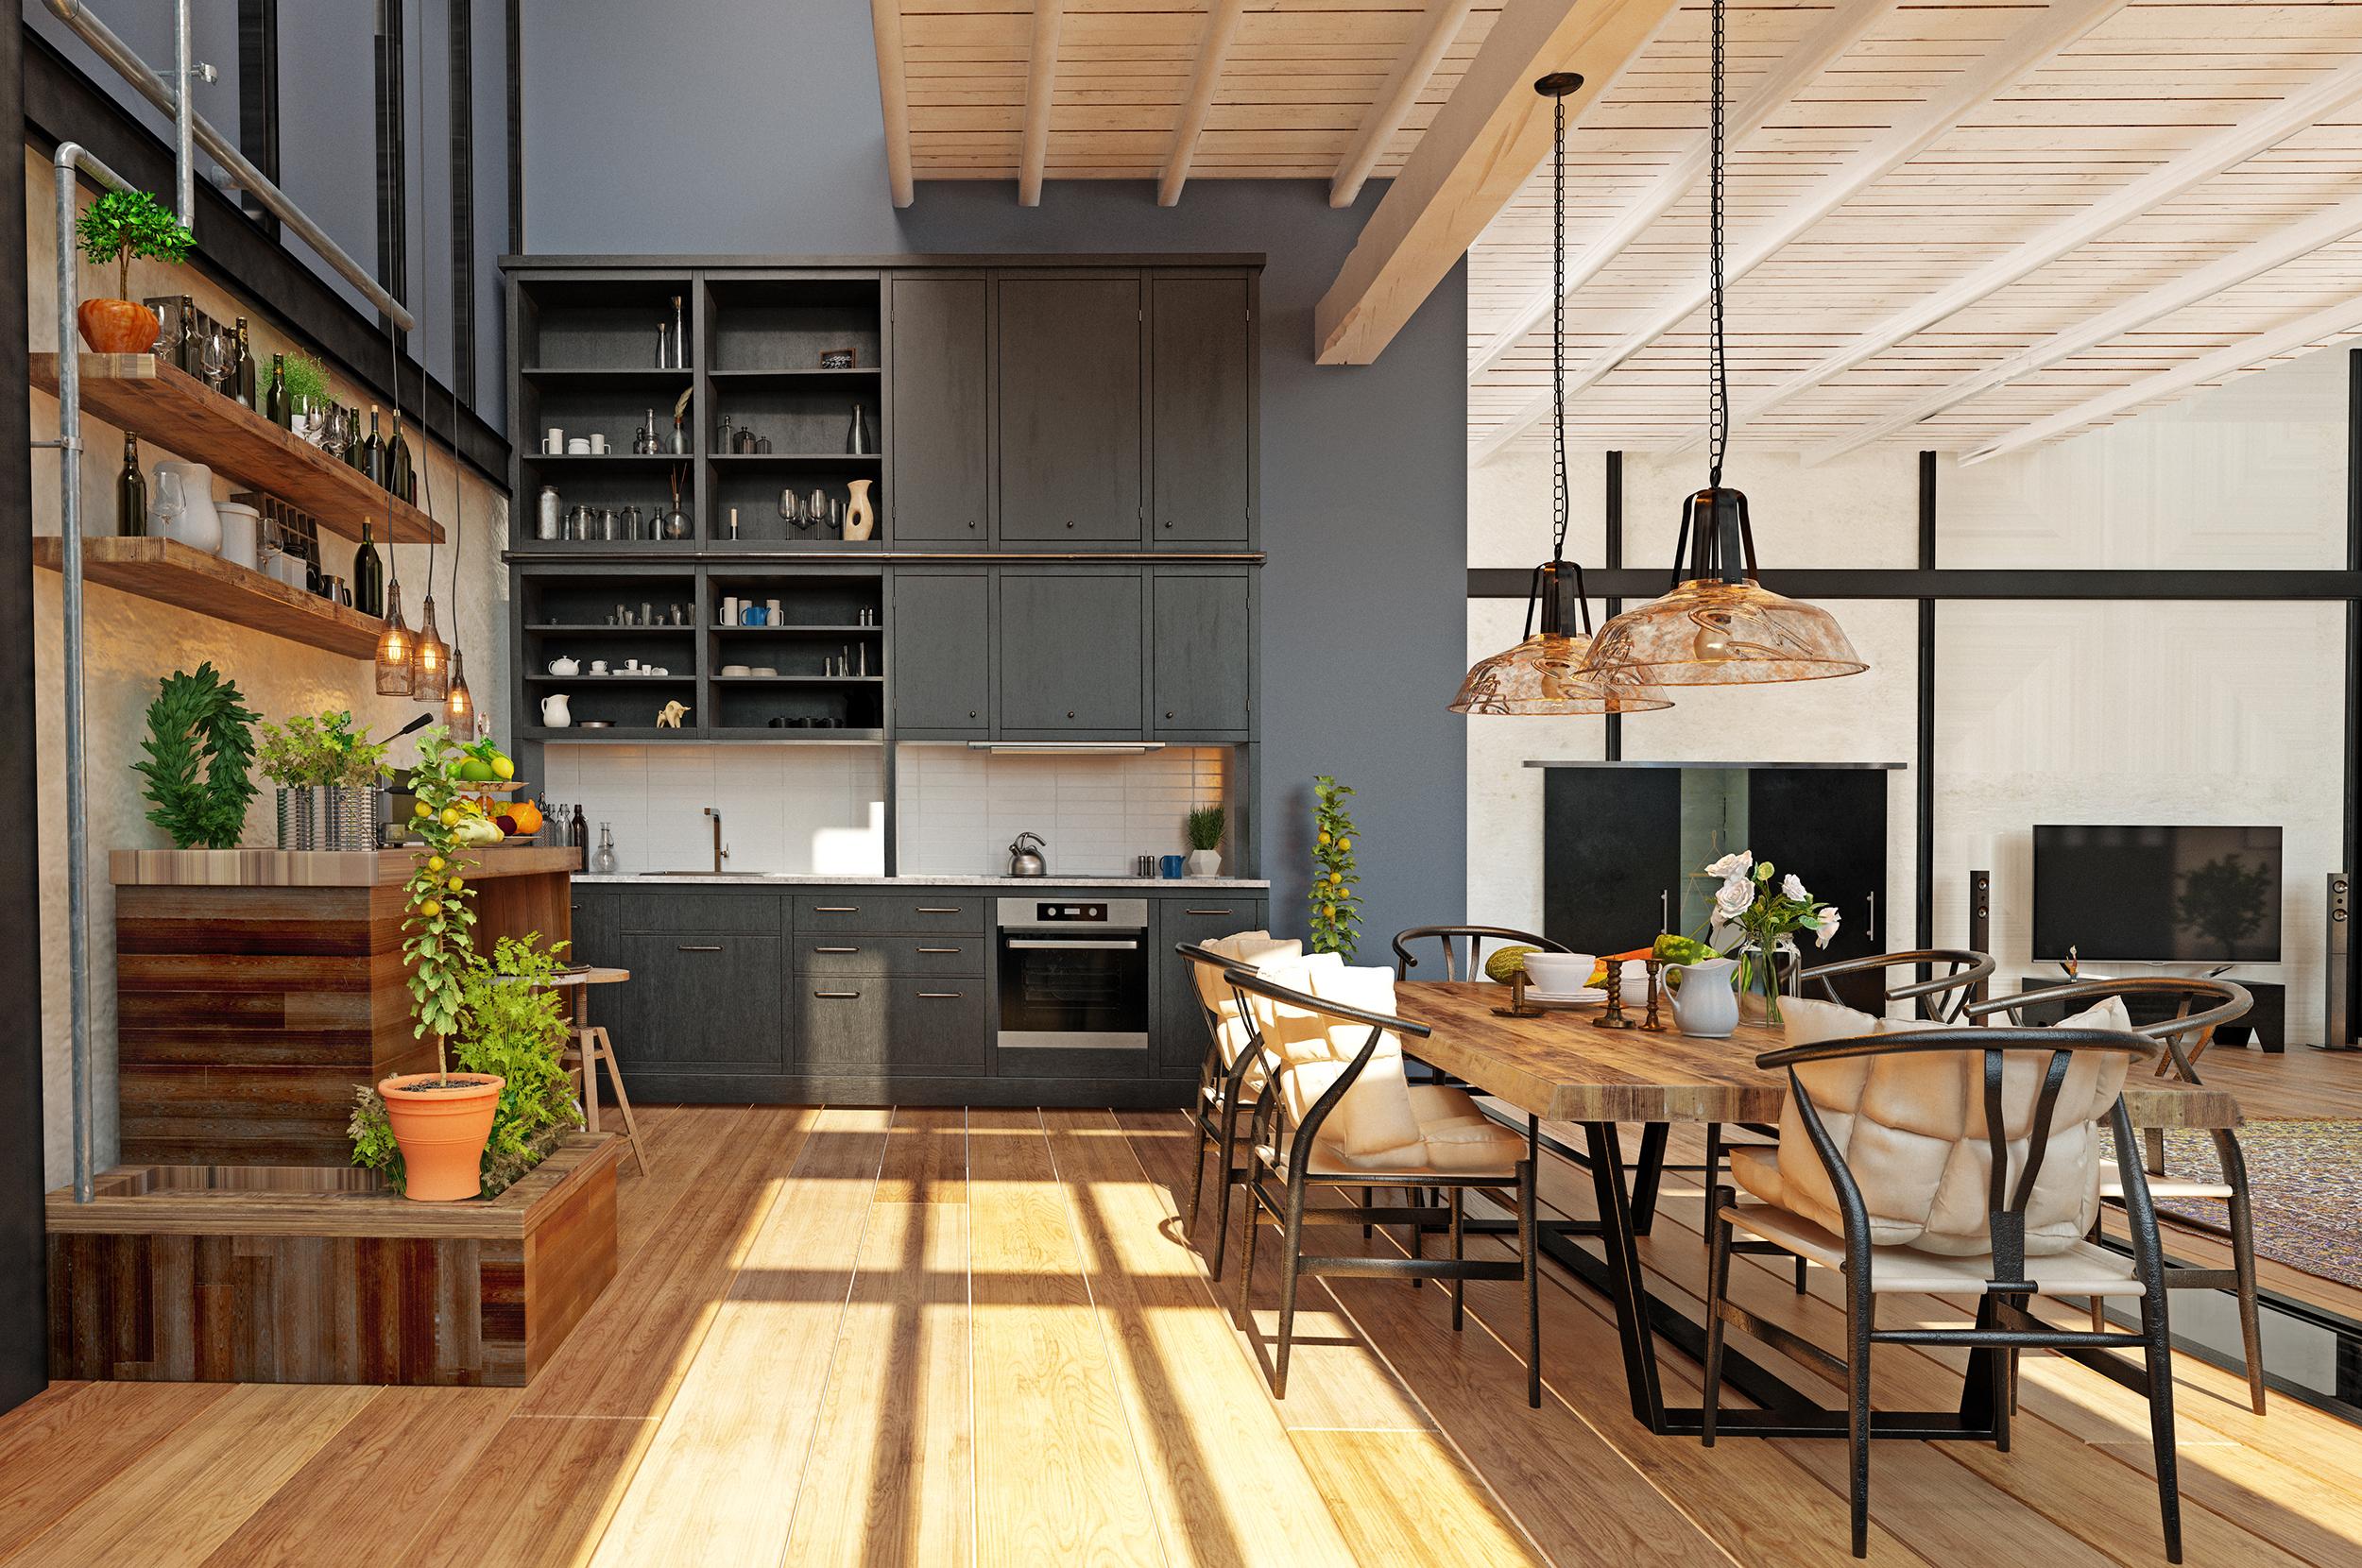 Kitchen Open Shelves Ideas   Oasis Kitchen Cabinets